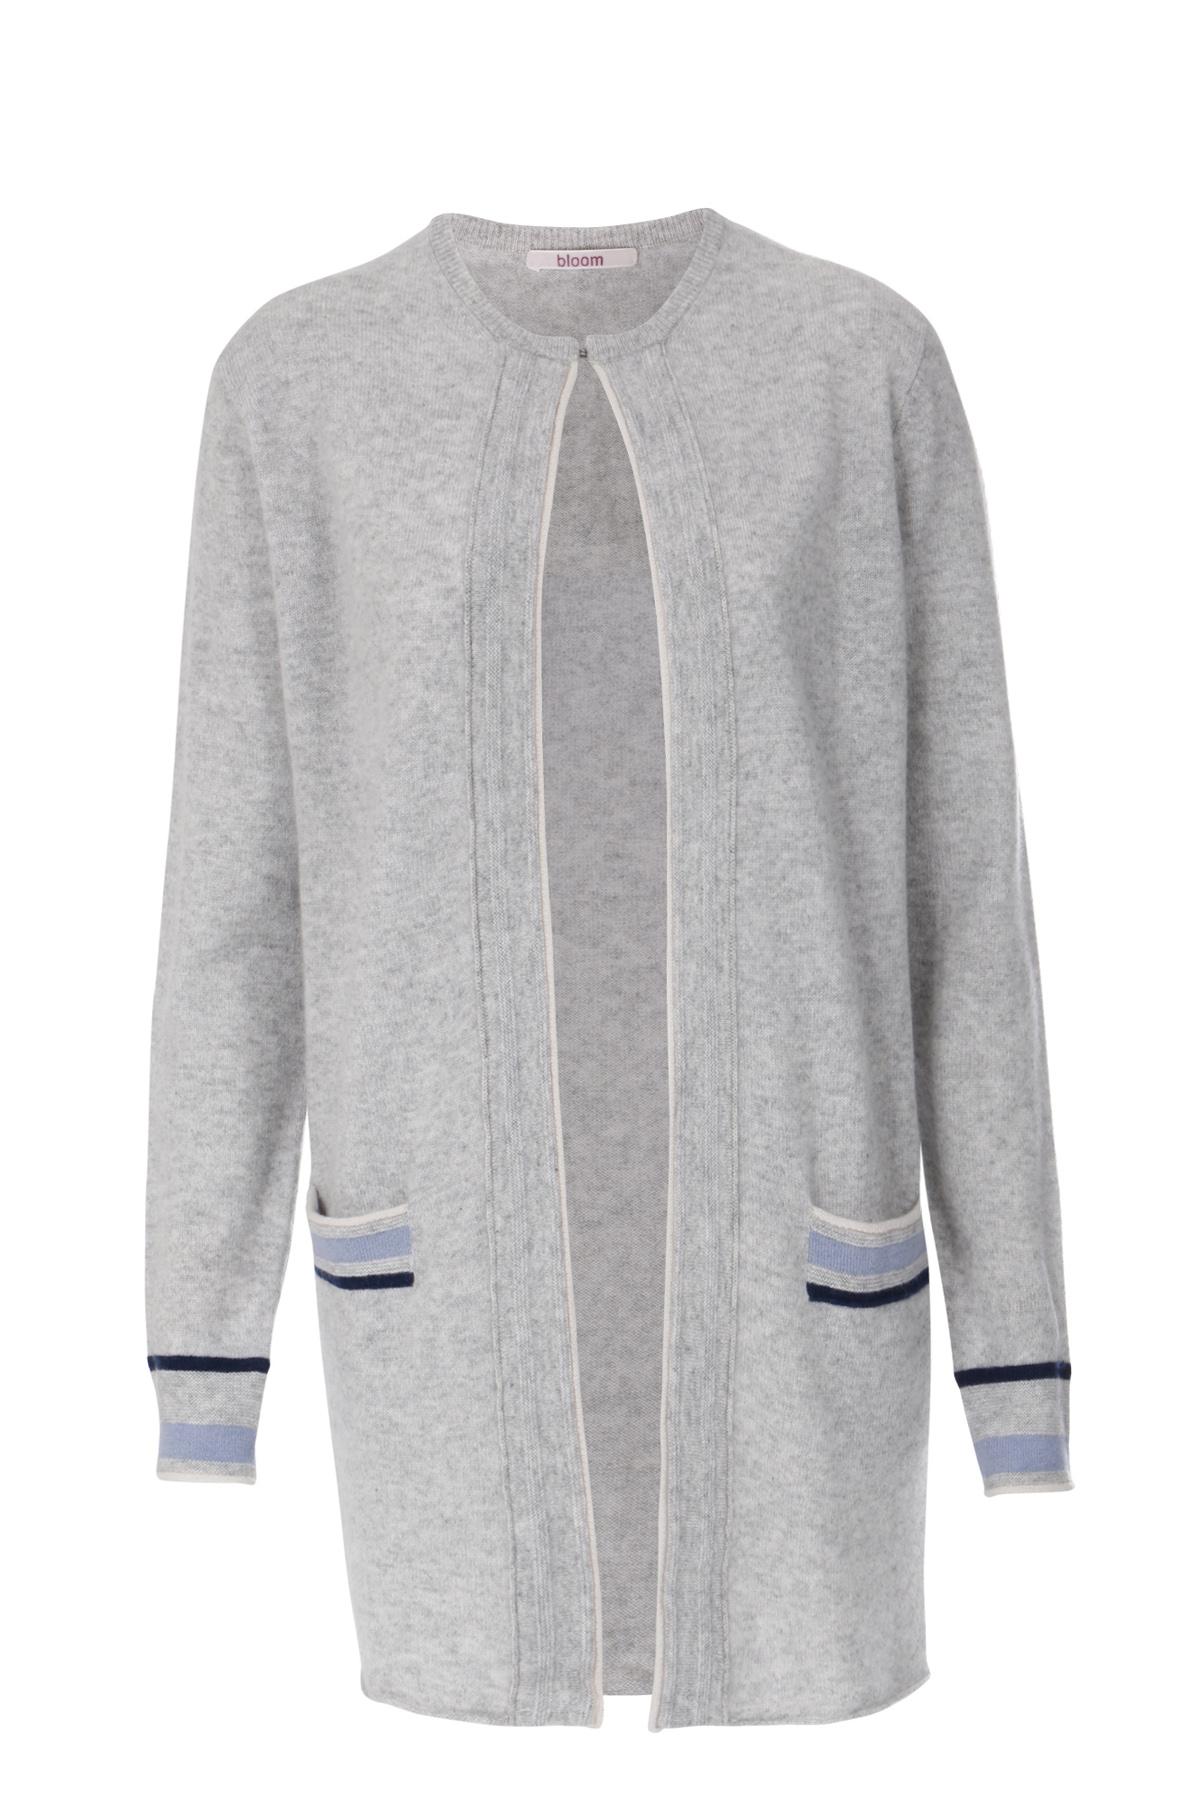 cardigan aus cashmere grey melange von bloom bei cashmere. Black Bedroom Furniture Sets. Home Design Ideas